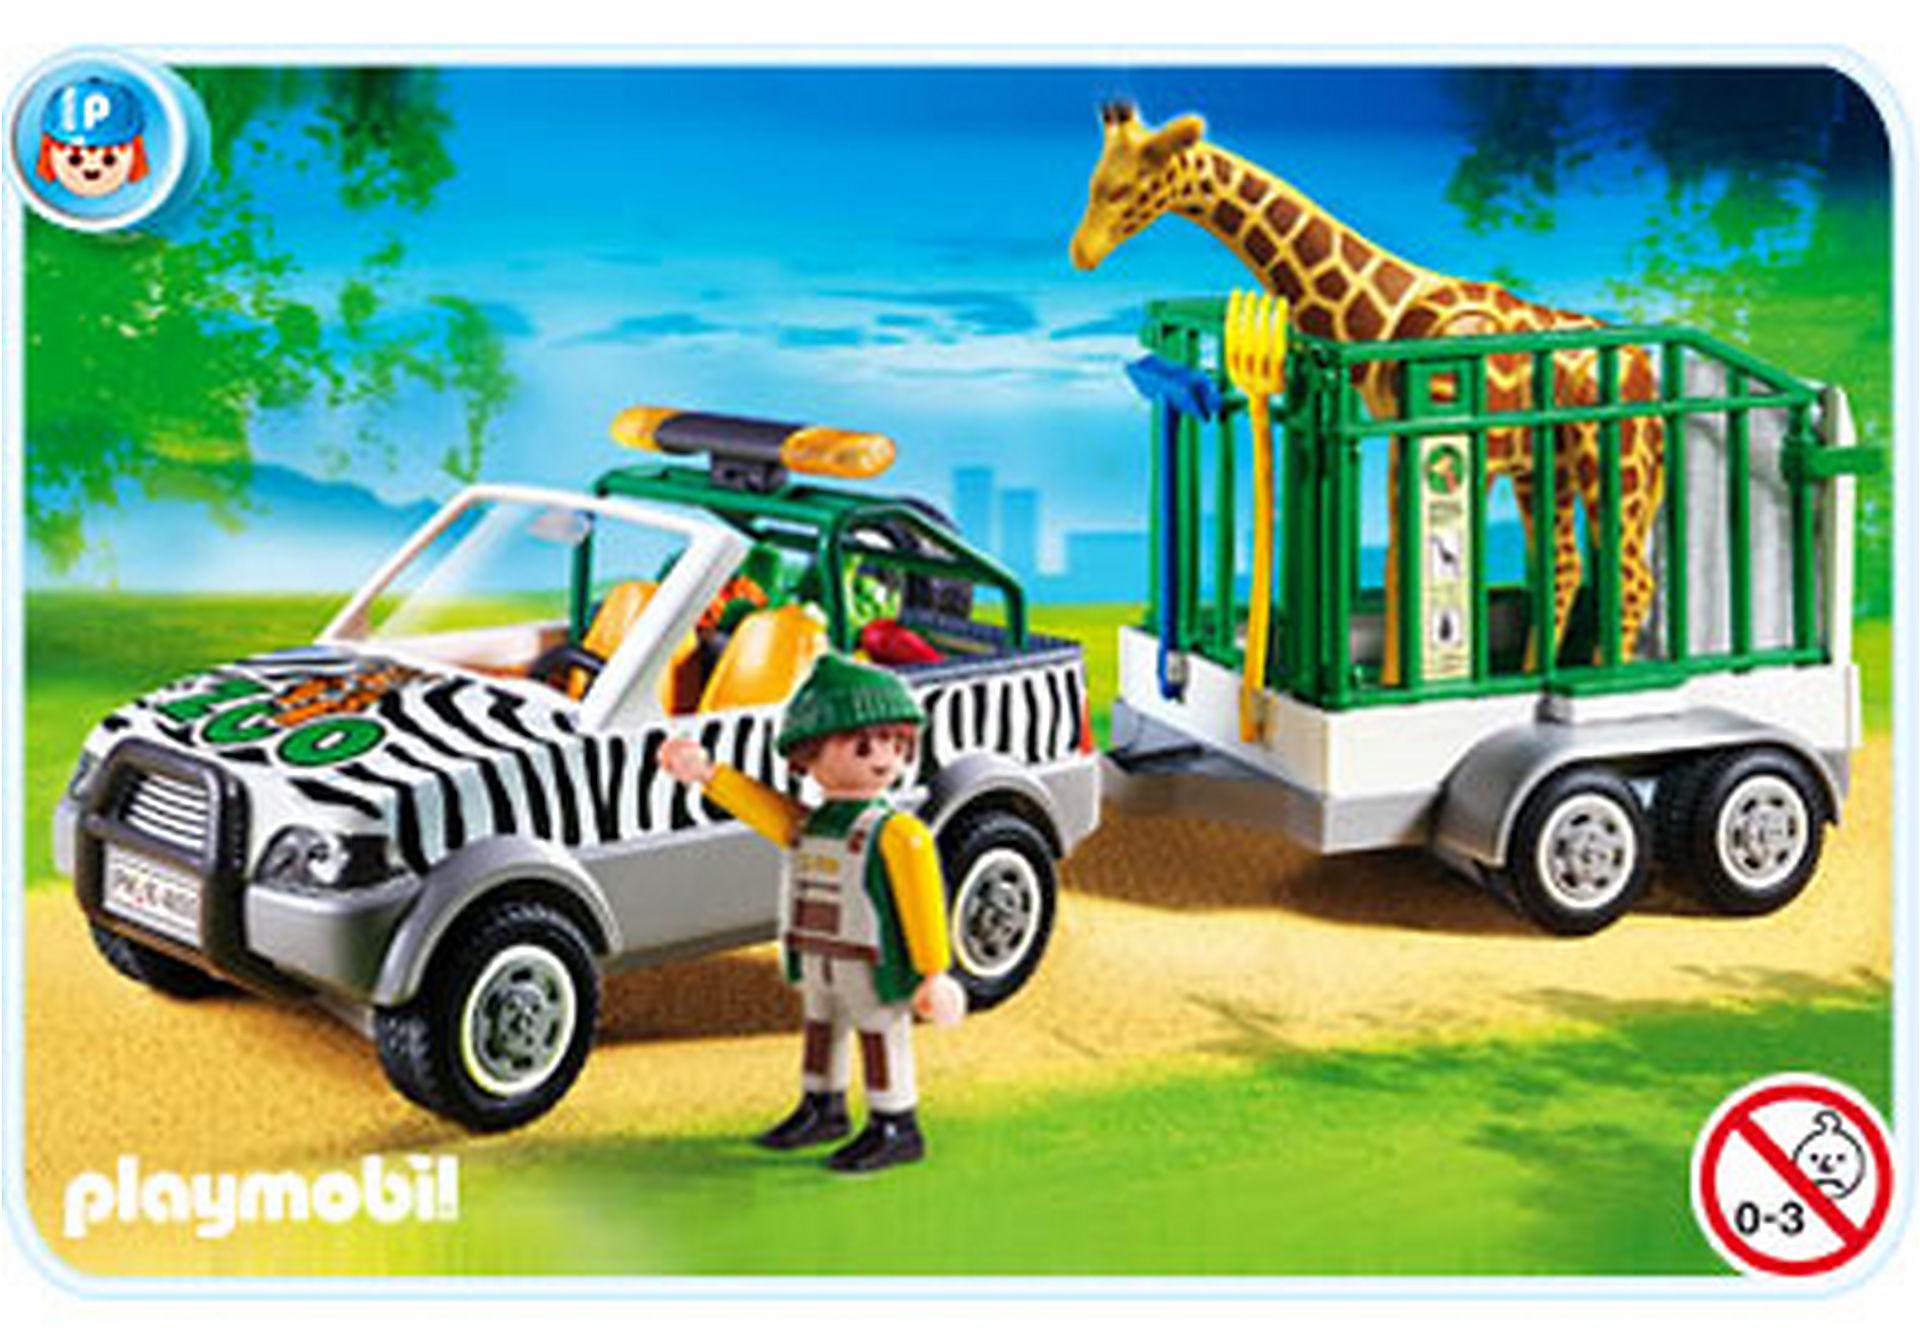 4855-A Zoo-Fahrzeug mit Anhänger zoom image1